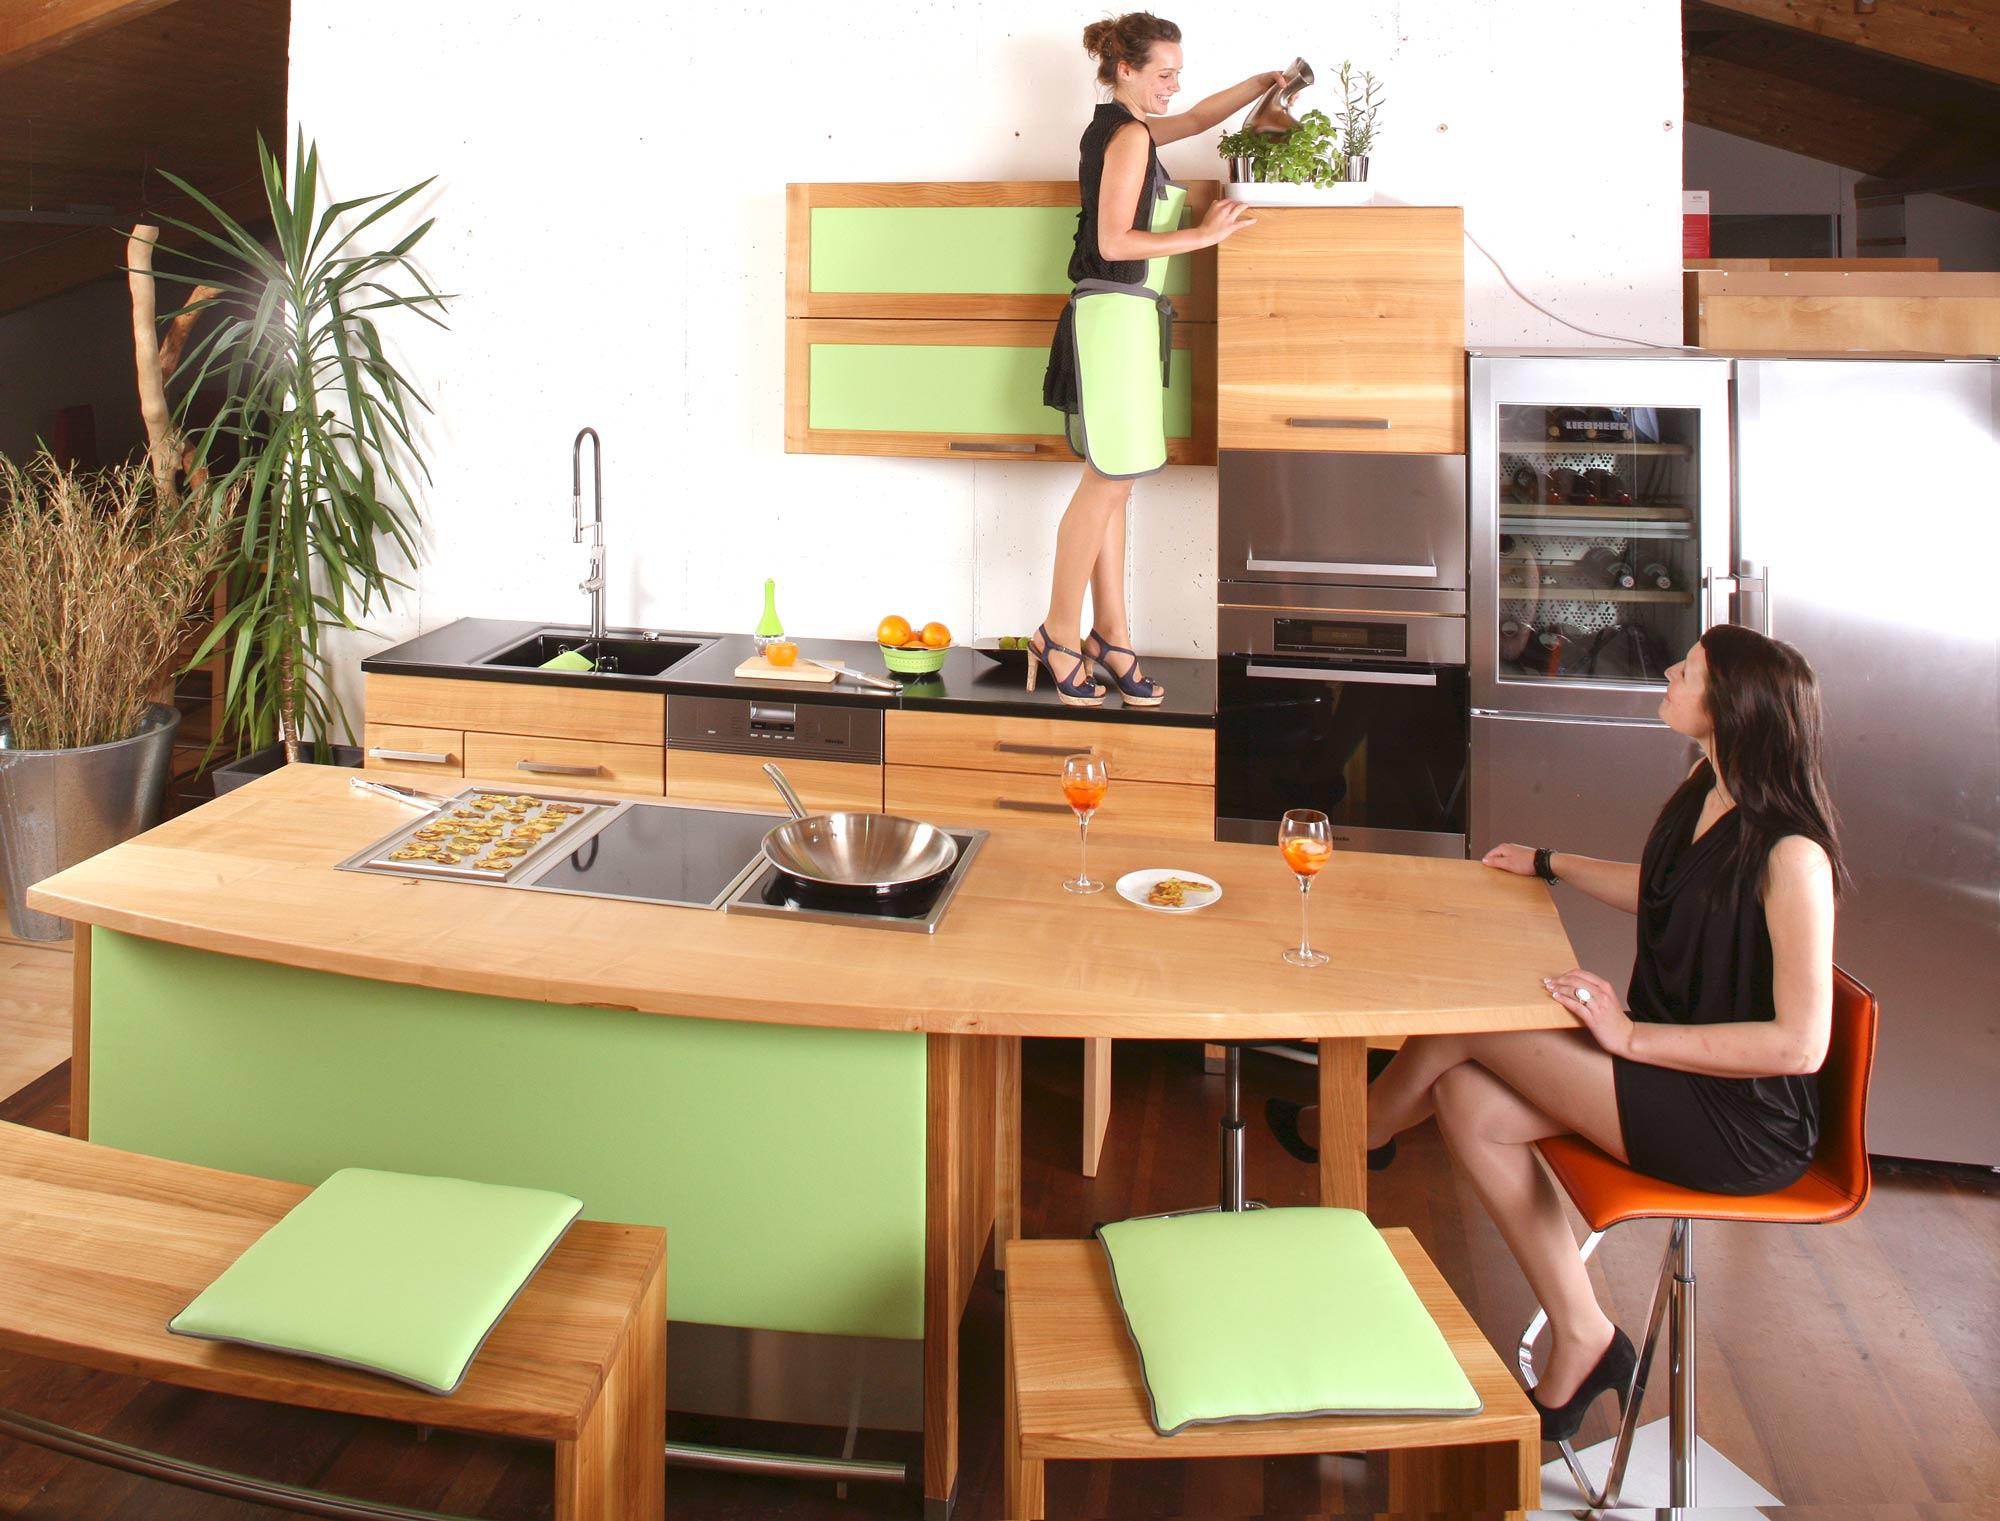 Best Küchenblock Selber Bauen Ideas - Ridgewayng.com - ridgewayng.com